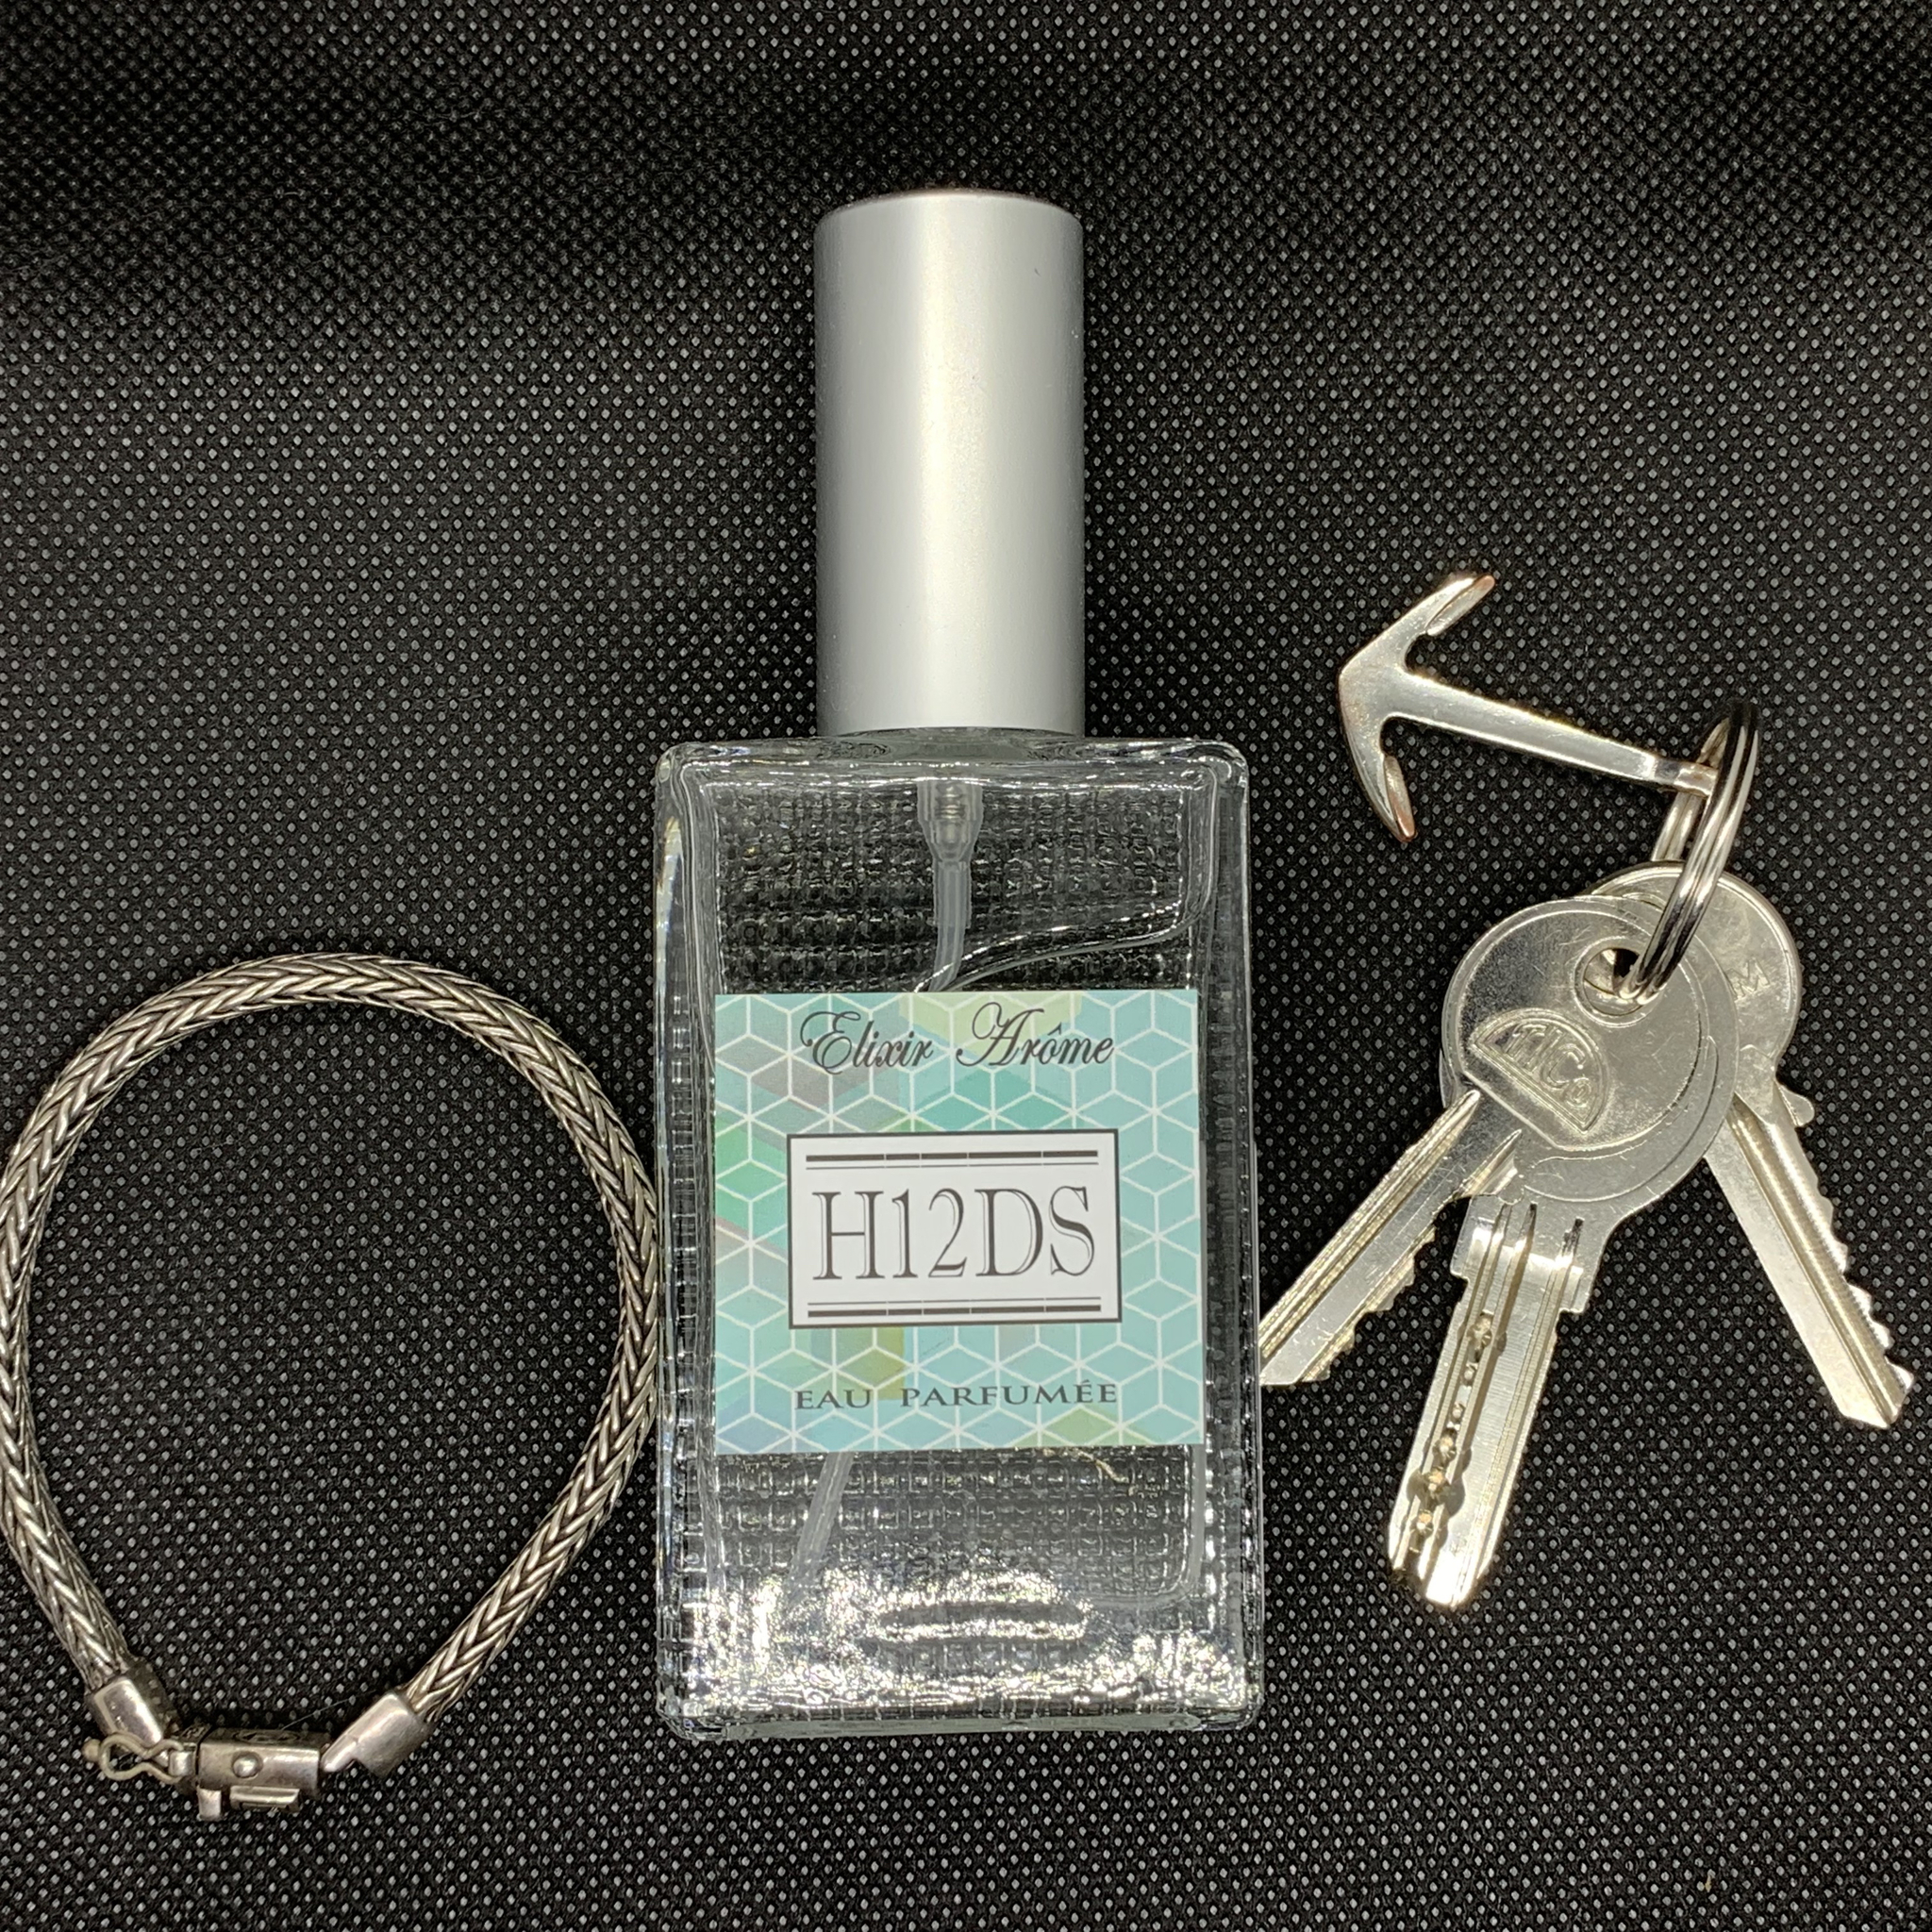 AR Elixir Aroma Парфюмированная вода H12DS 50 ml